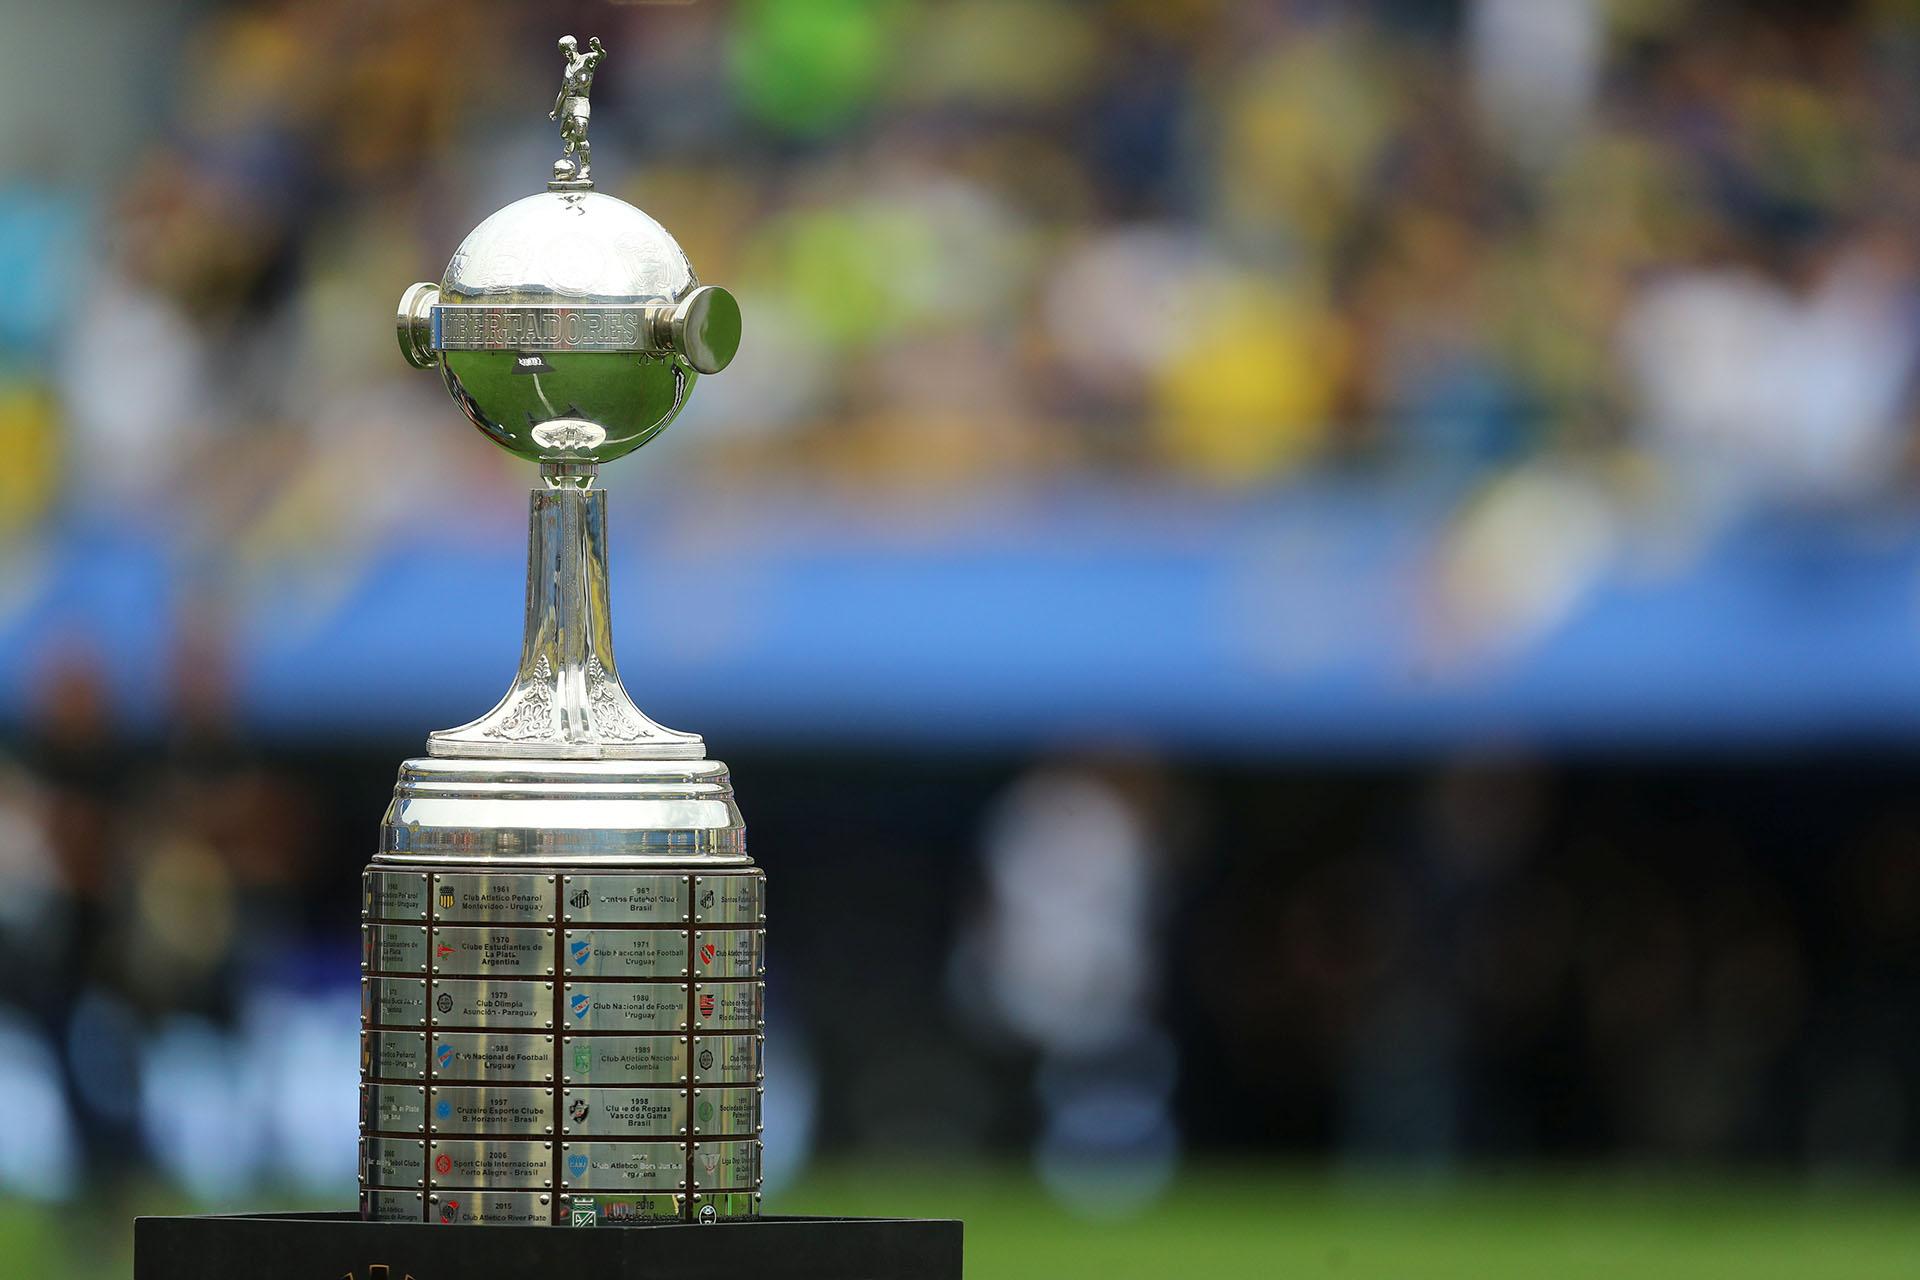 Árbitros confirmados para los próximos partidos de Copa Libertadores